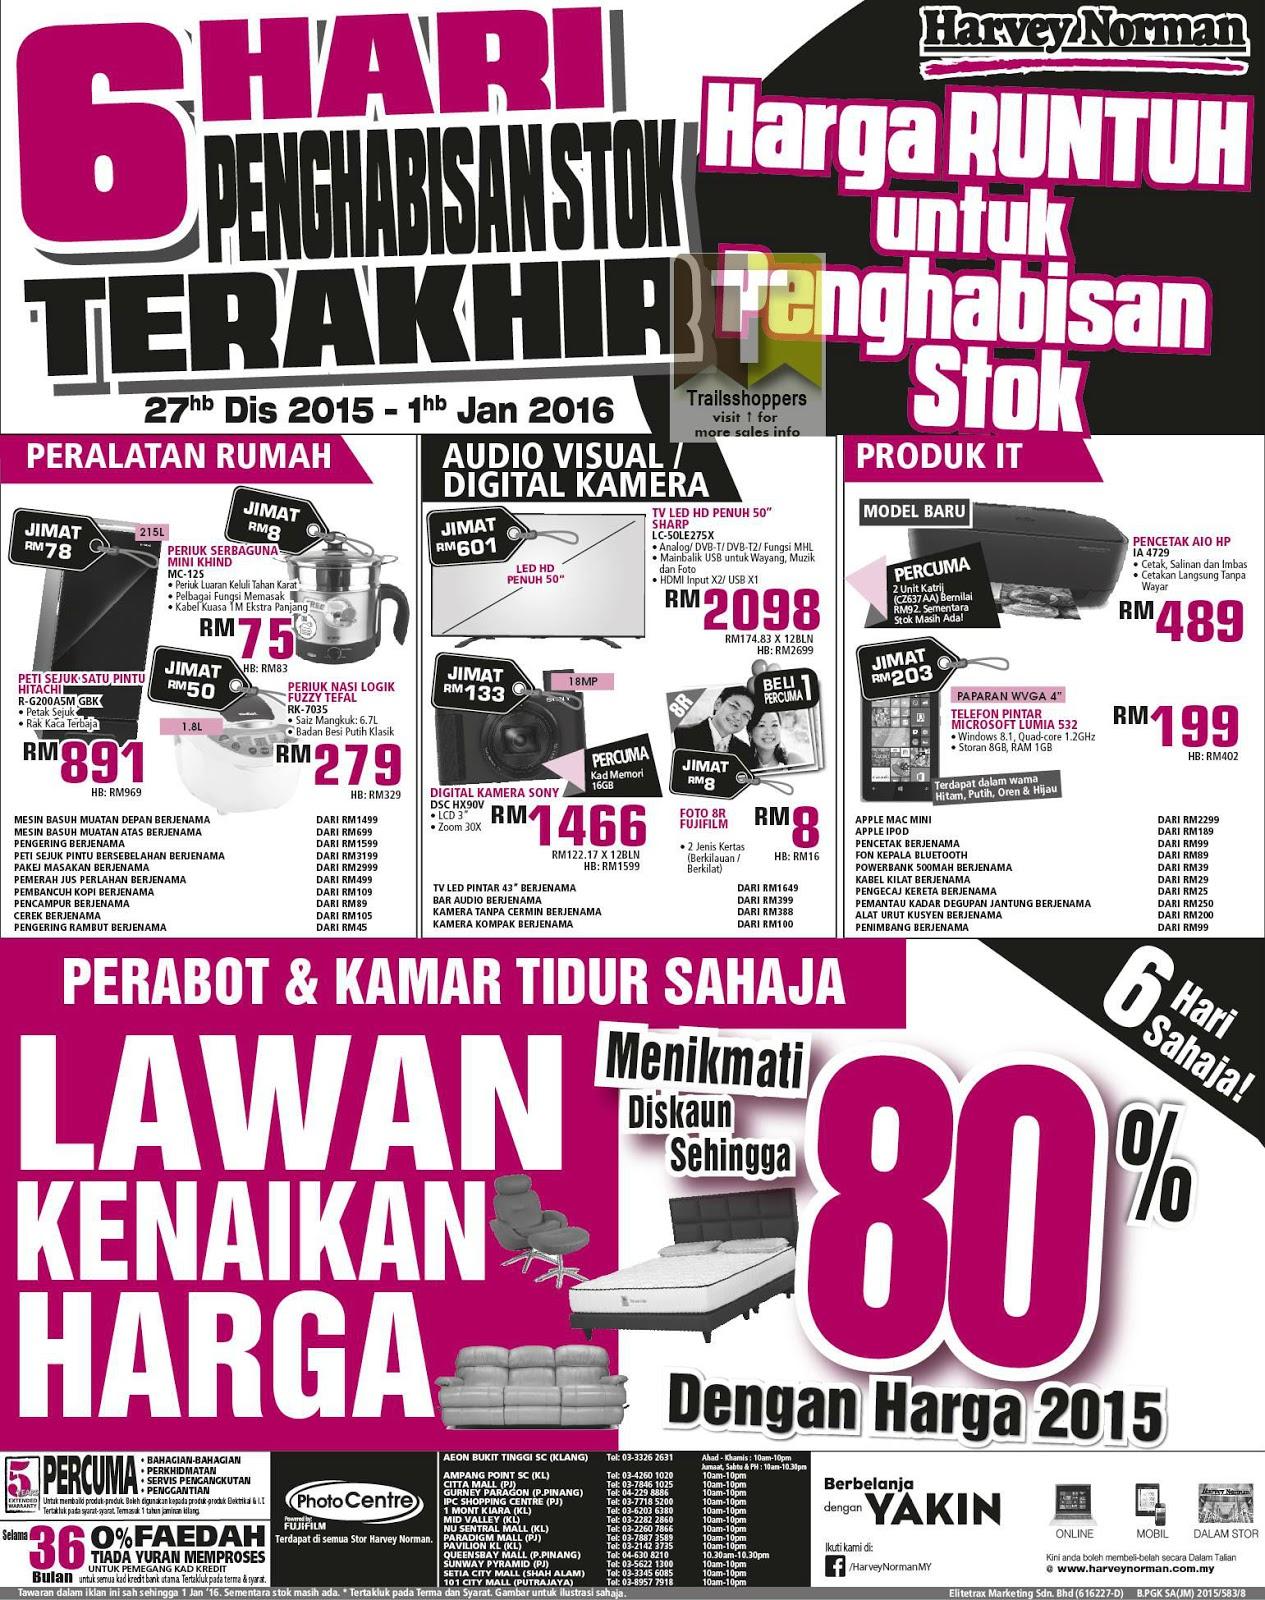 Harvey Norman Malaysia Final Clearance 2015 2016